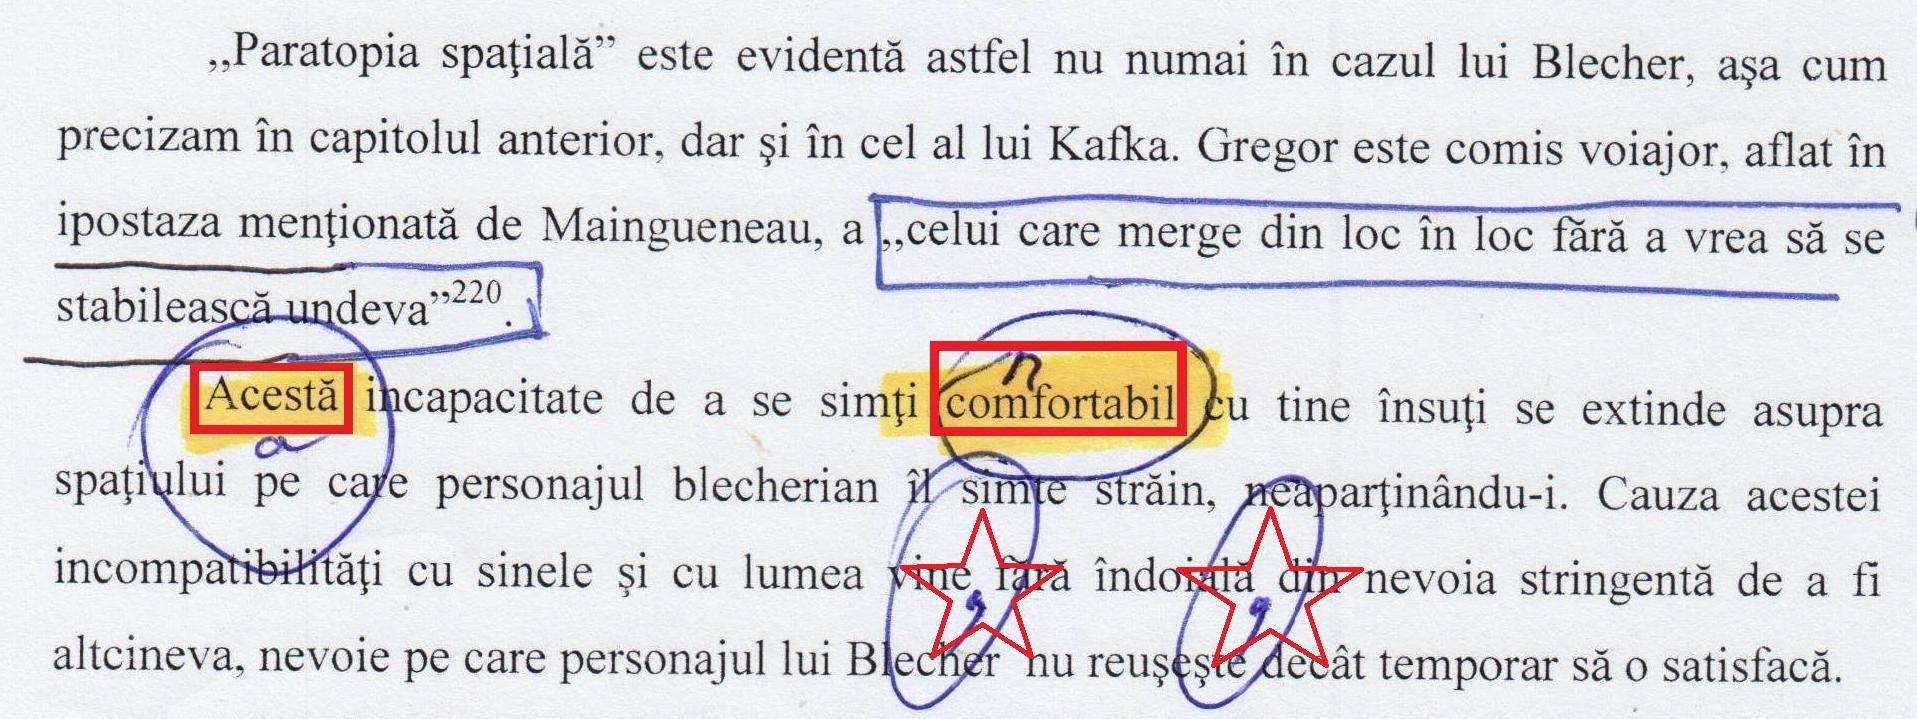 """Comfortabil"", coana doctor Ciobotaru? (pag. 90)."